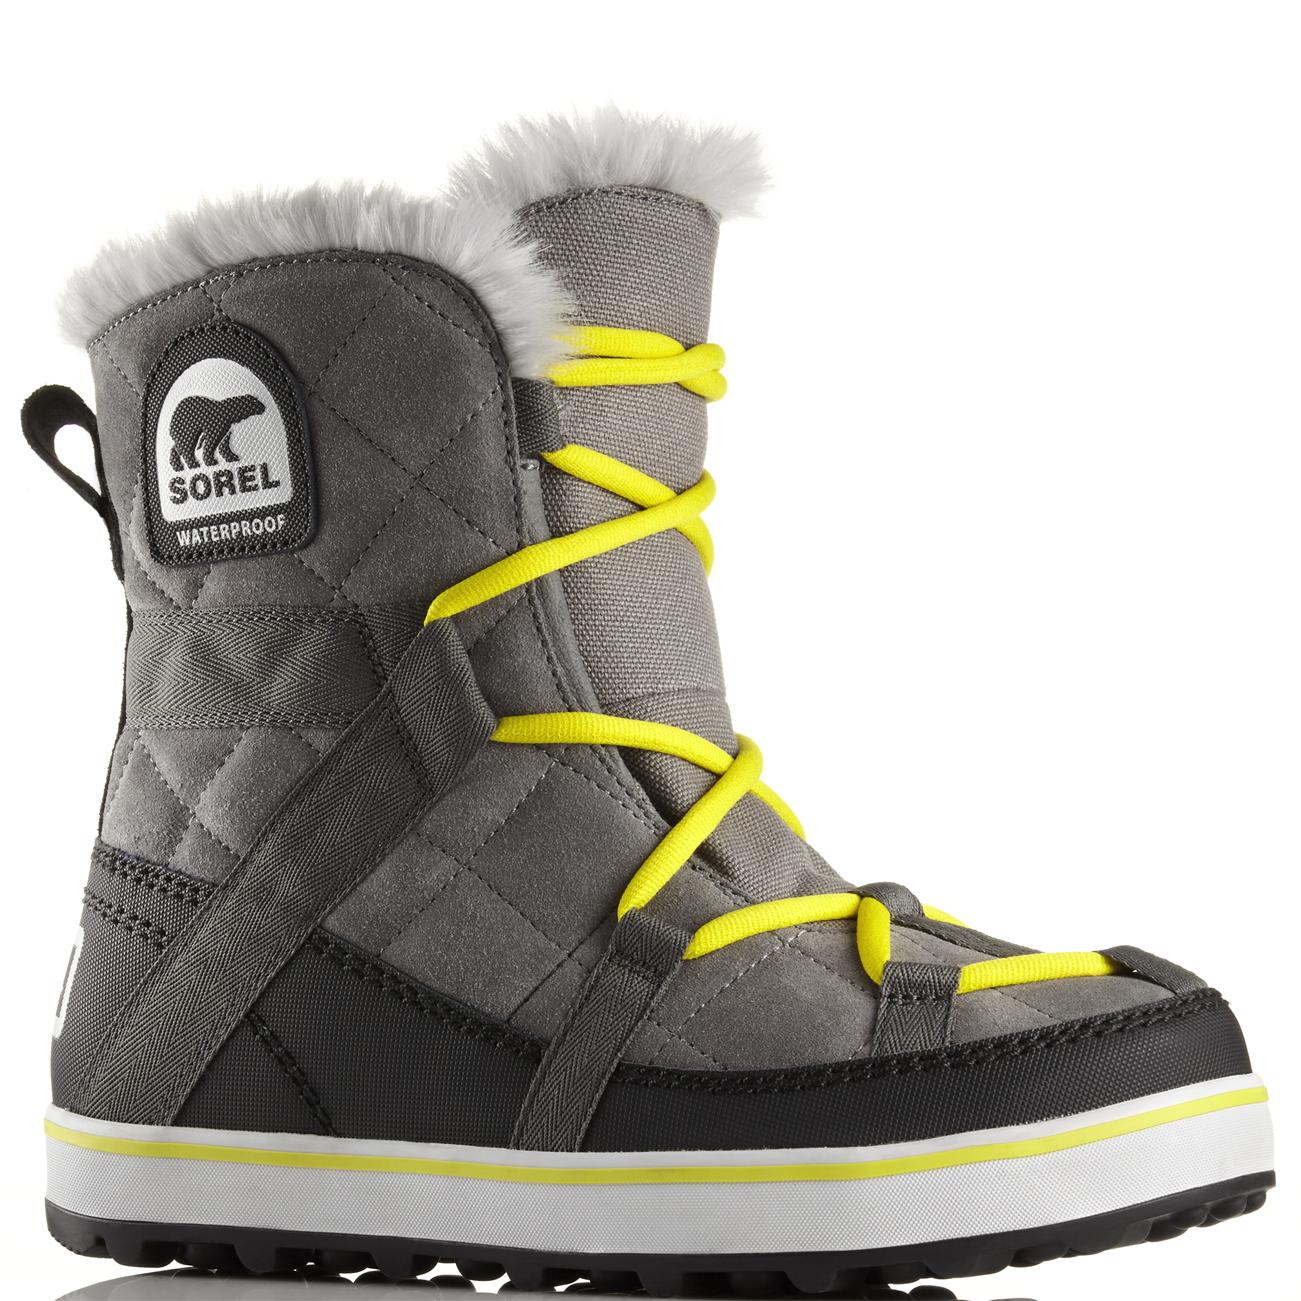 c3eb031ec79a Womens Sorel Glacy Explorer Shortie Waterproof Snow Hiking Winter ...